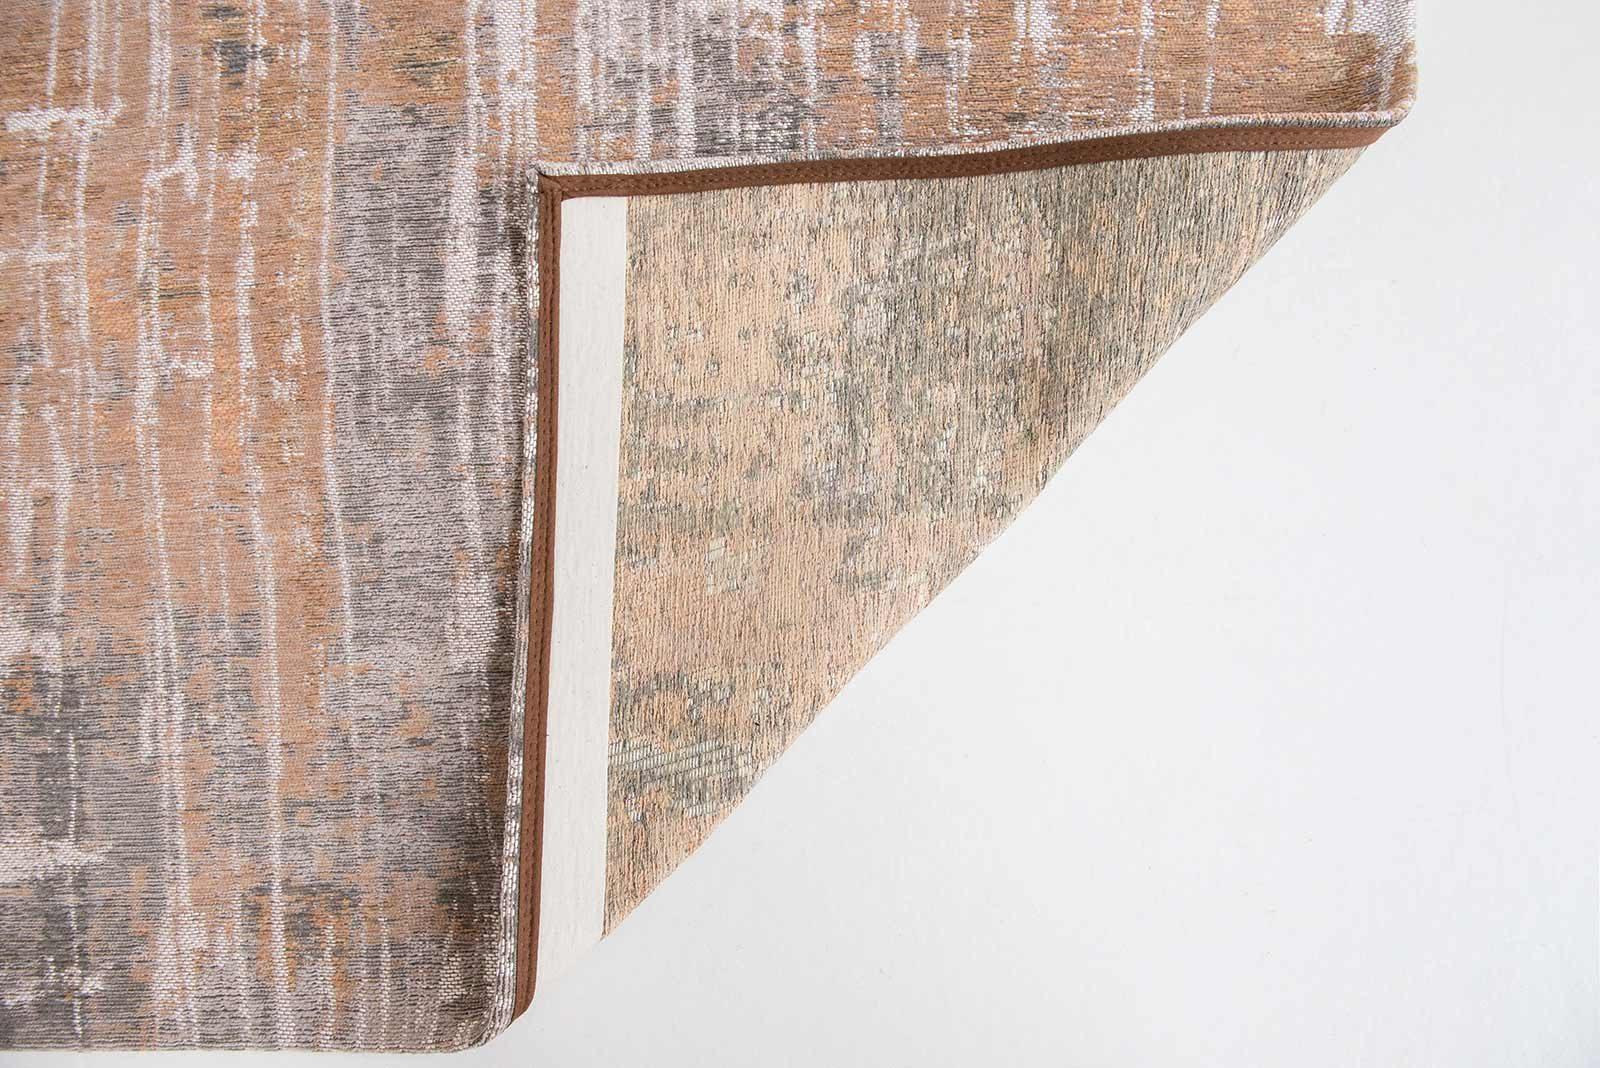 rugs Louis De Poortere LX8717 Atlantic Streaks Parsons Powder back